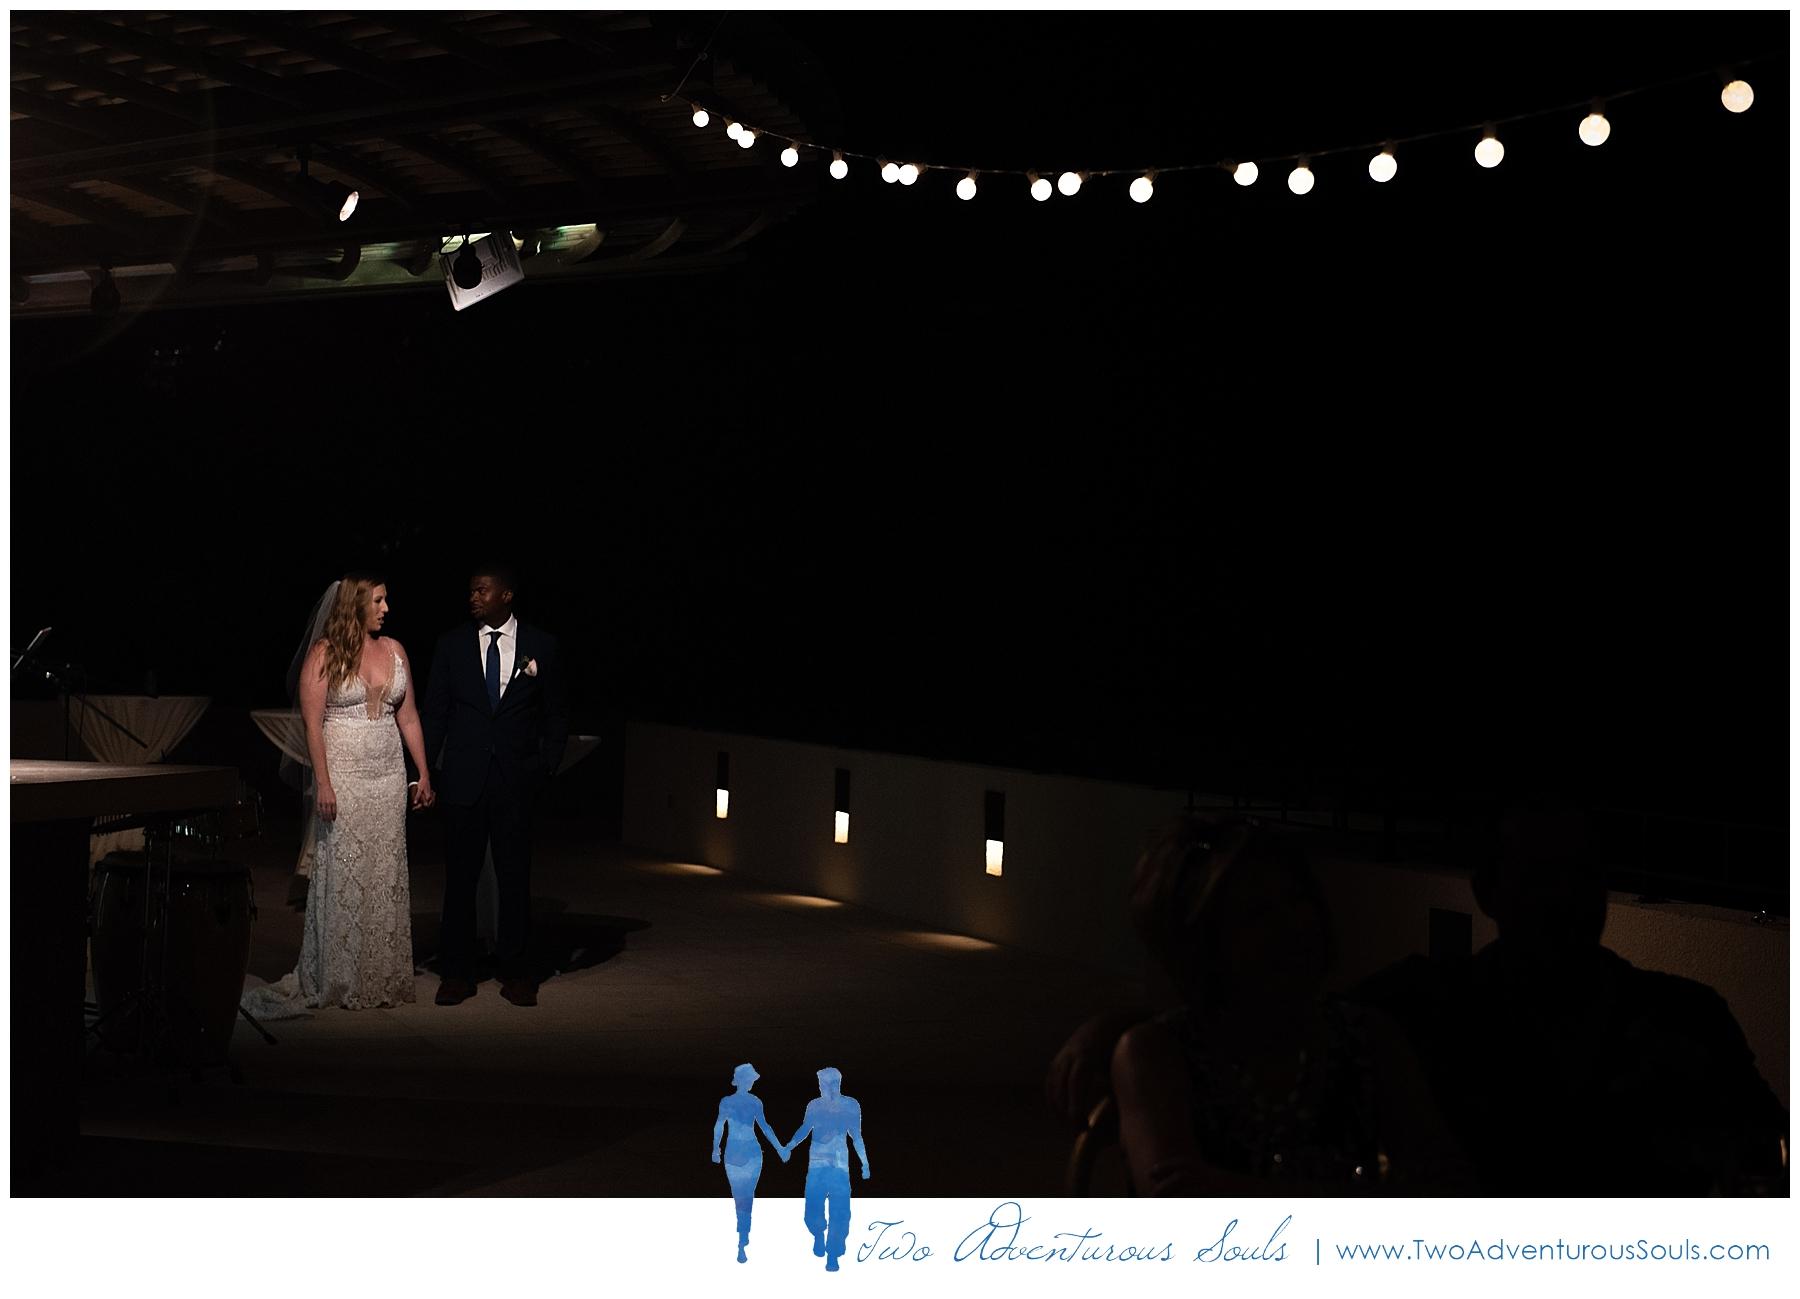 Costa Rica Wedding Photographers, Dreams las Mareas Wedding, Destination Wedding Photographers, Two Adventurous Souls - 022219_0040.jpg